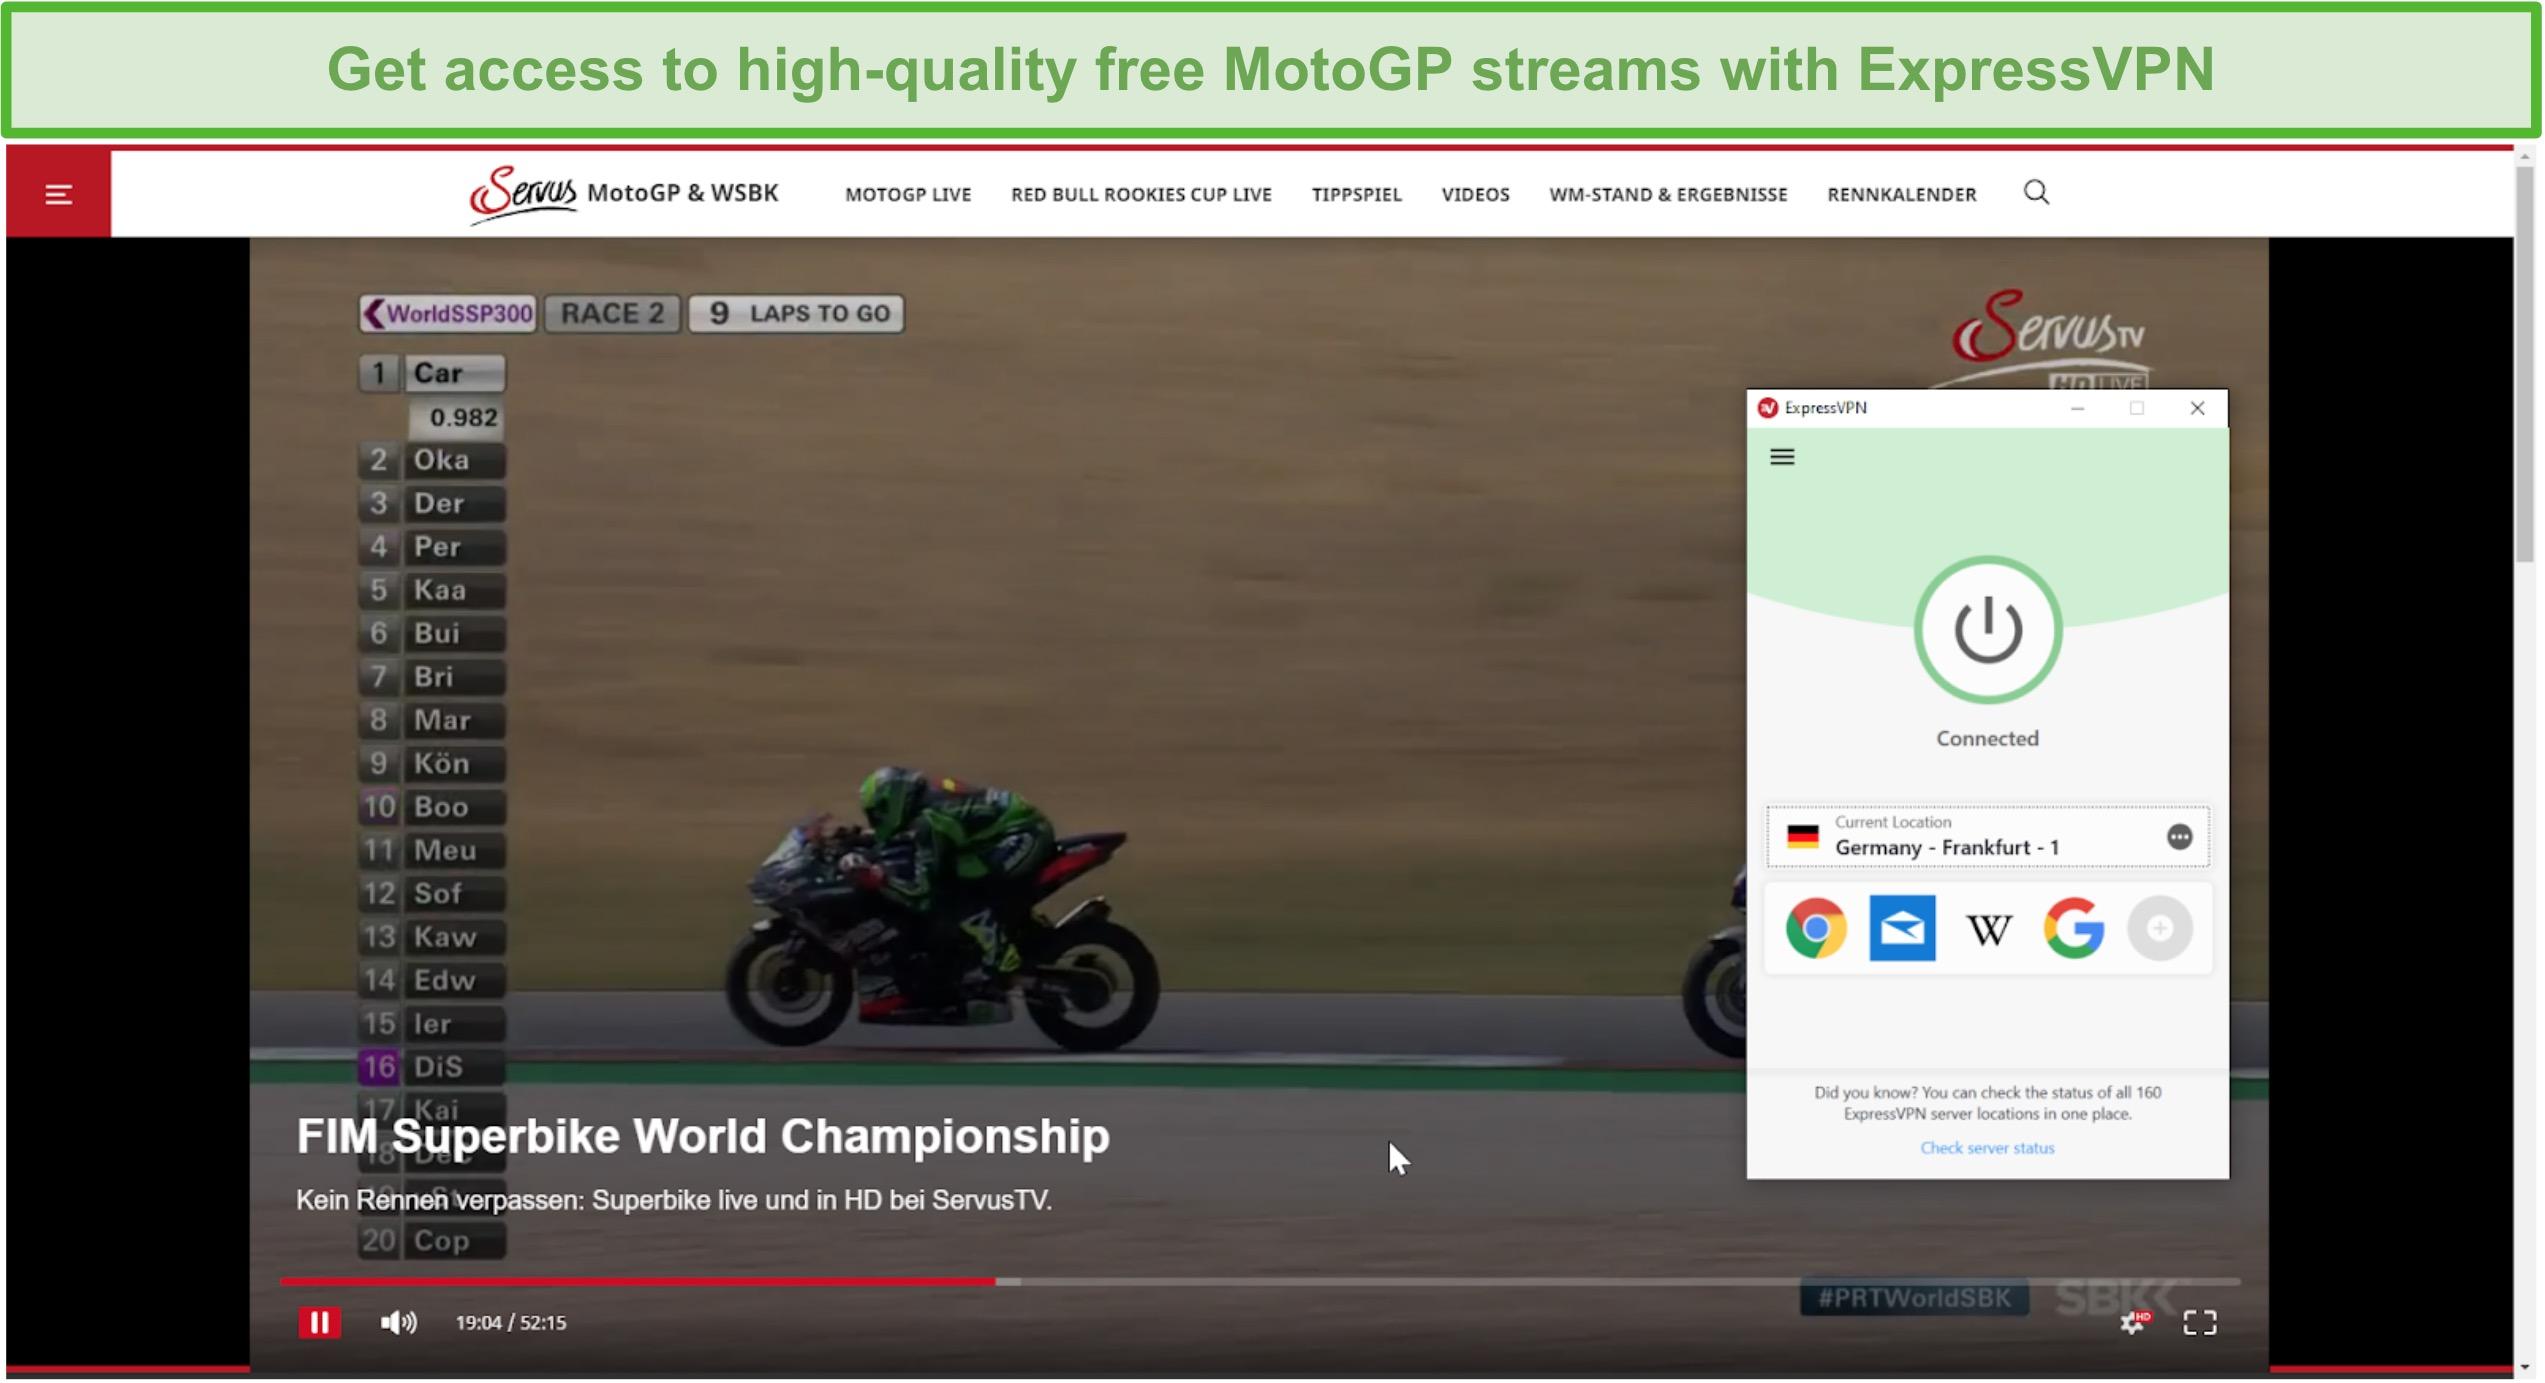 Screenshot of ExpressVPN connected to a German server and unblocking a MotoGP stream on ServusTV.